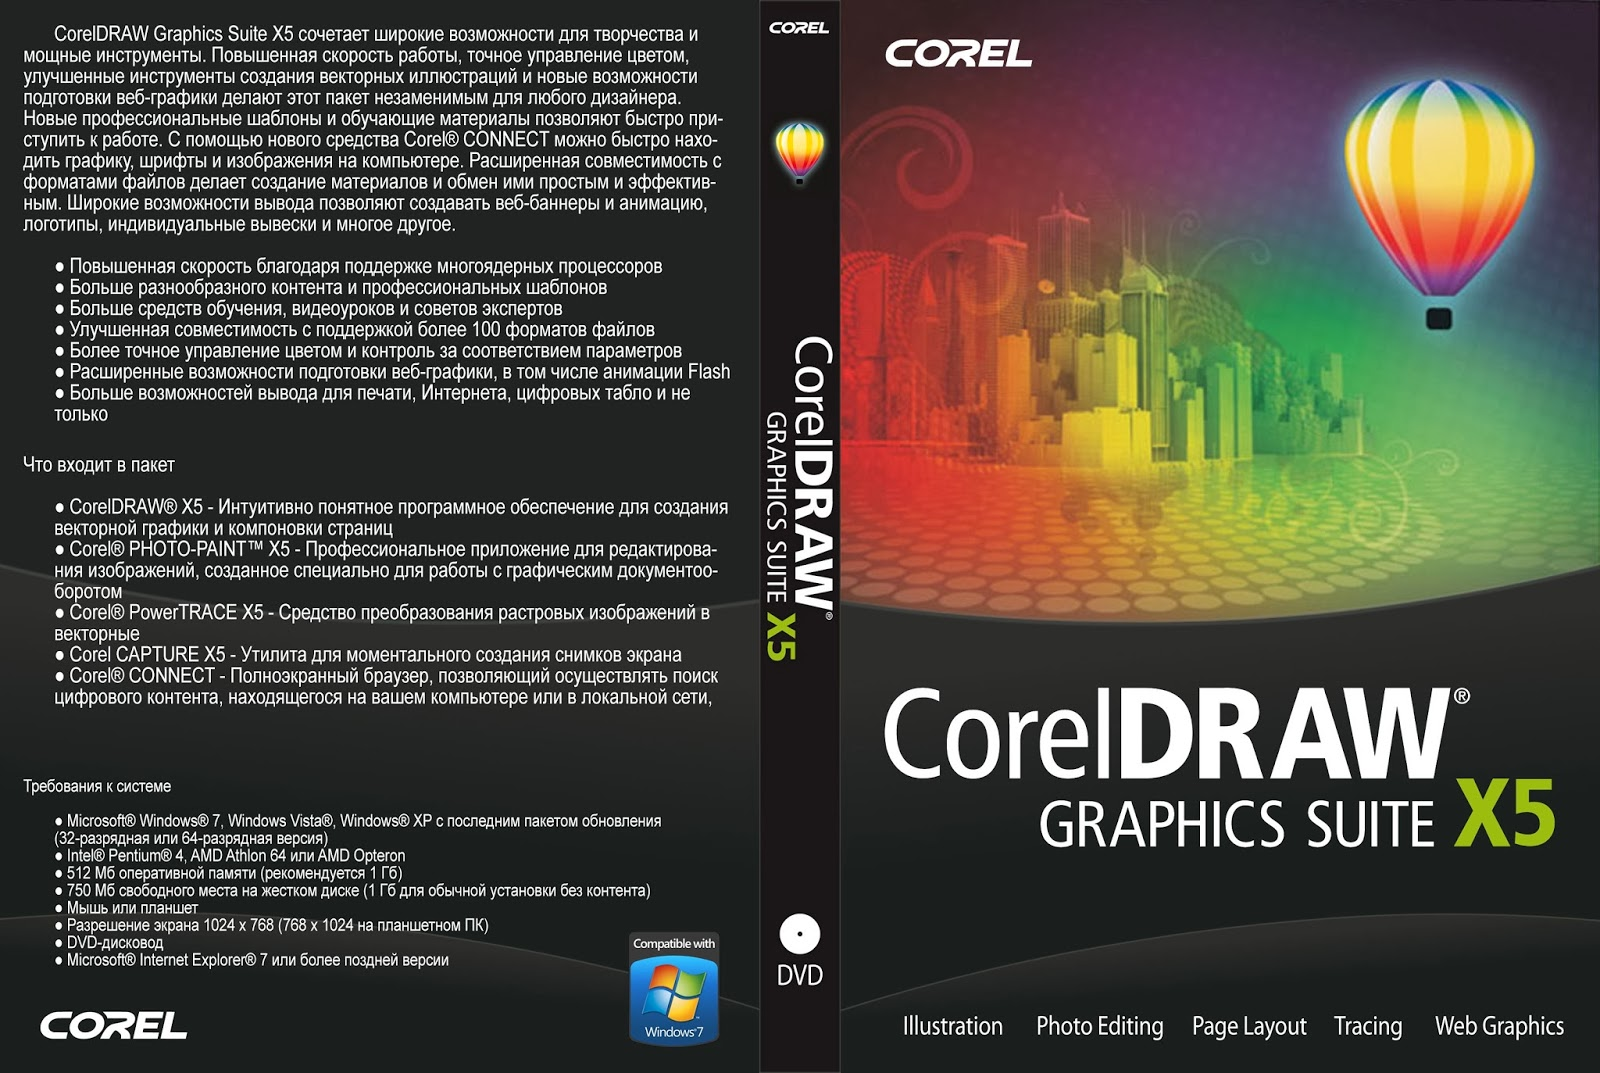 Corel draw x5 with keygen working catalyst